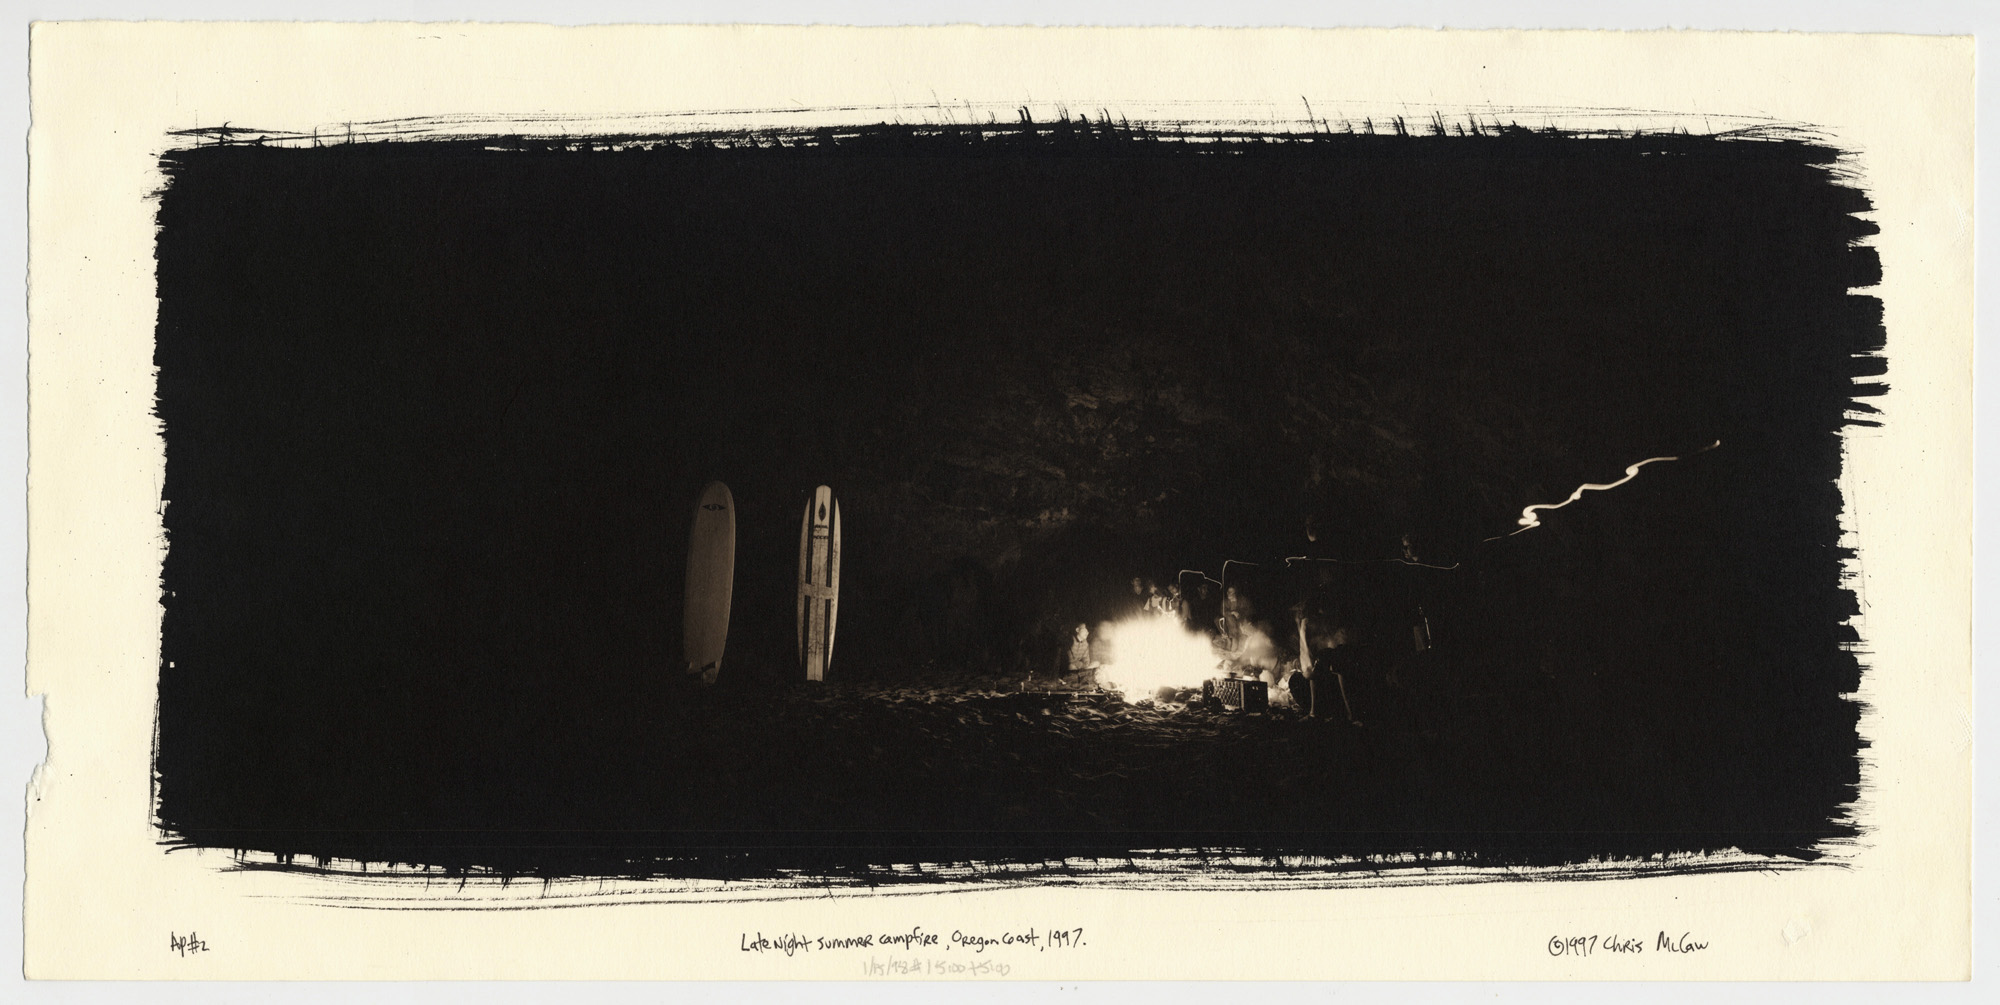 LATE NIGHT CAMPFIRE 1997.jpg